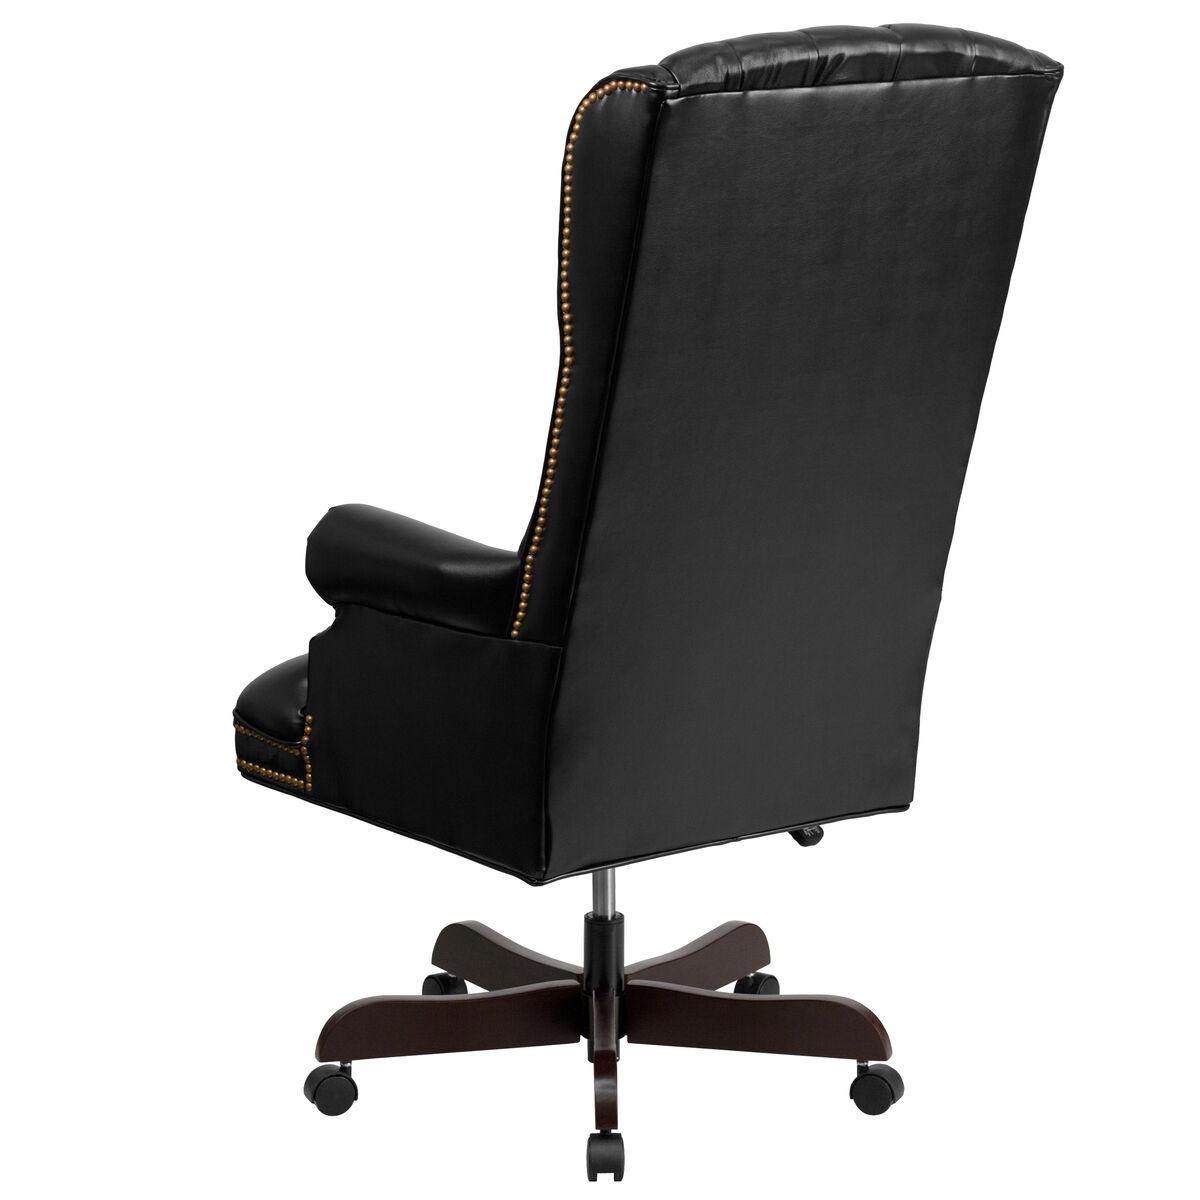 Flash furniture ci 360 bk gg for Furniture 360